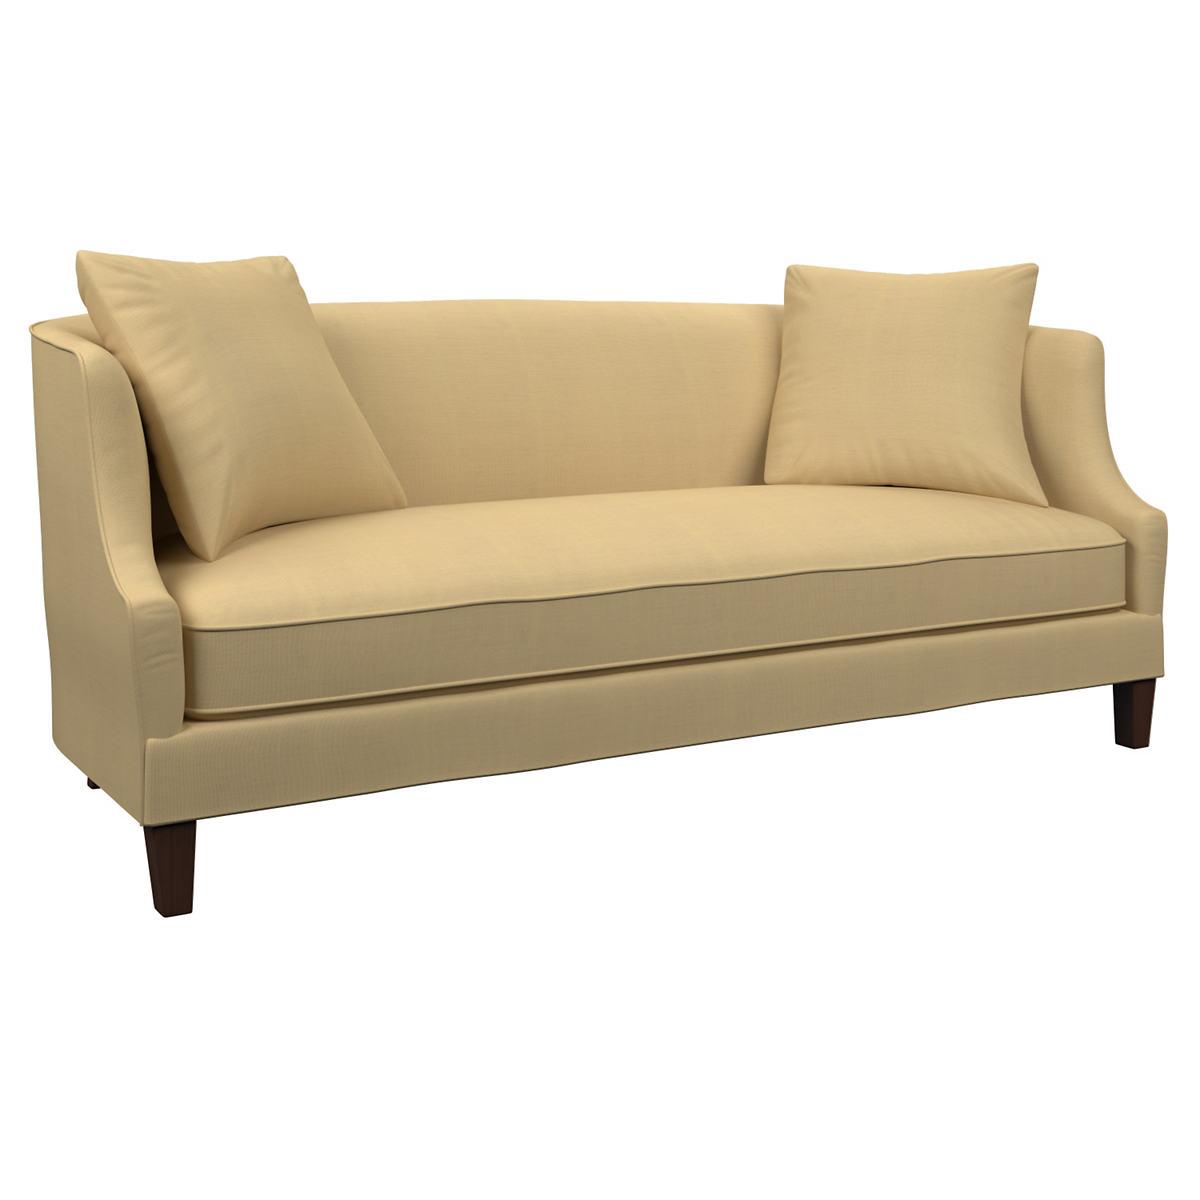 Estate Linen Wheat Cheshire Sofa